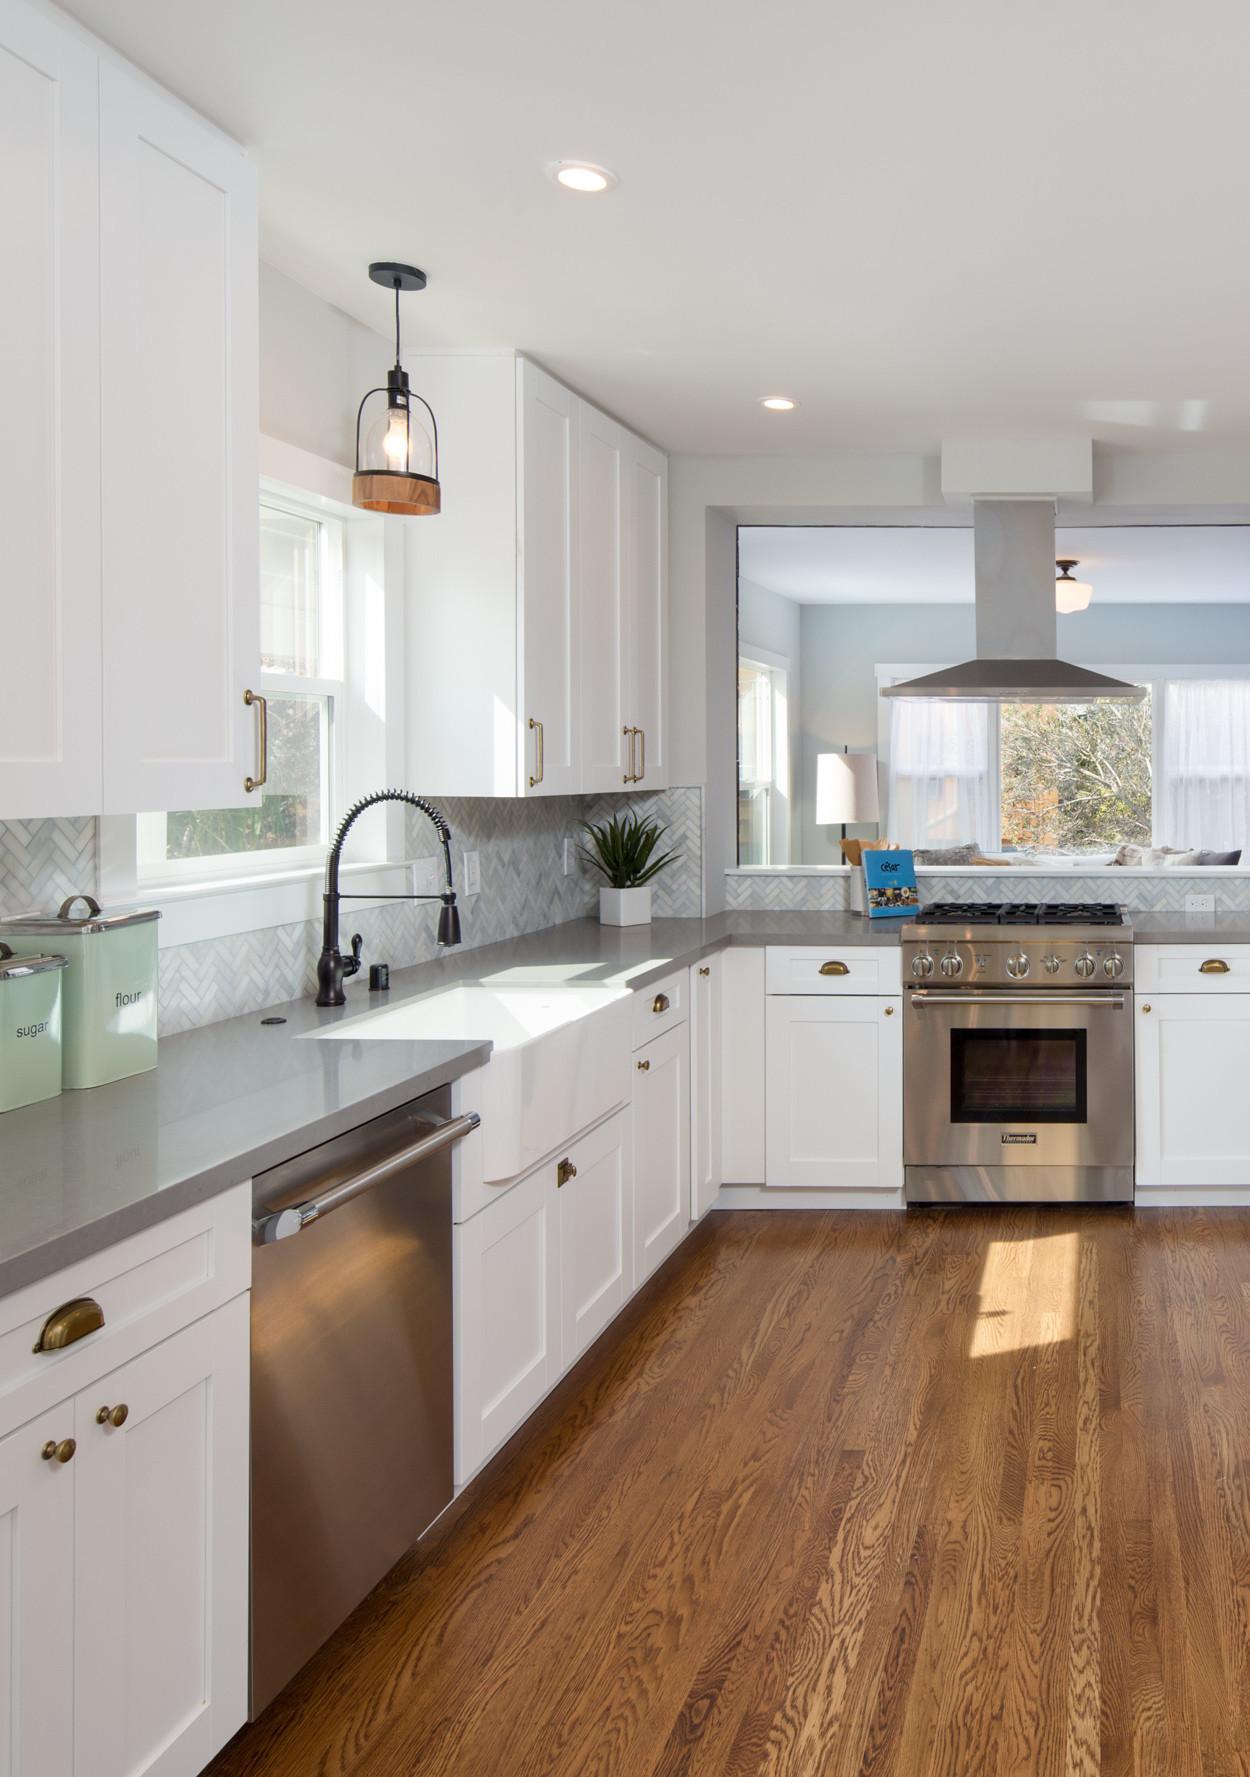 Best ideas about White Kitchen Ideas . Save or Pin Farmhouse Inspired White Kitchen Ideas Now.